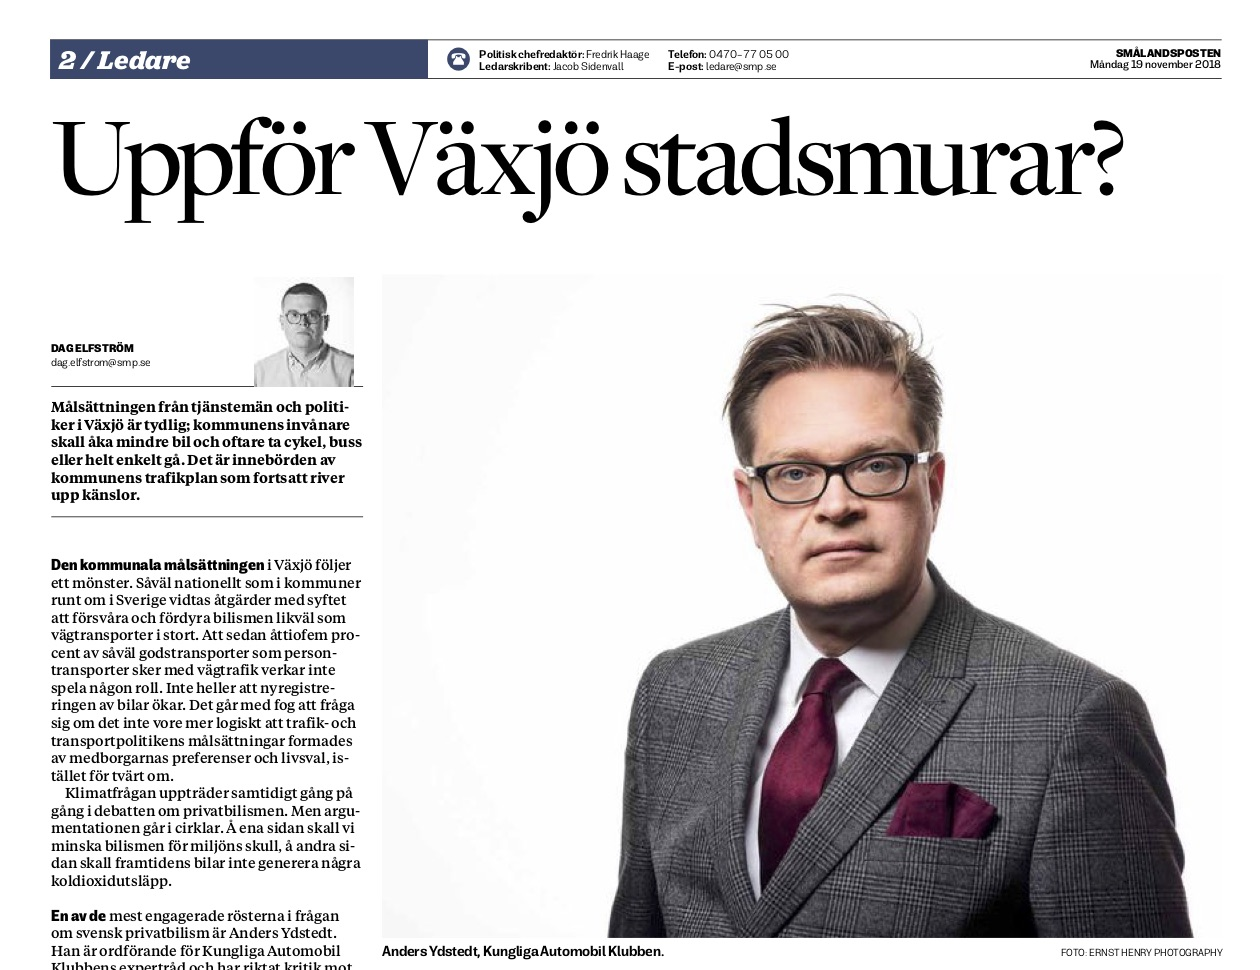 Sydsvenskans chefredaktor dod 3